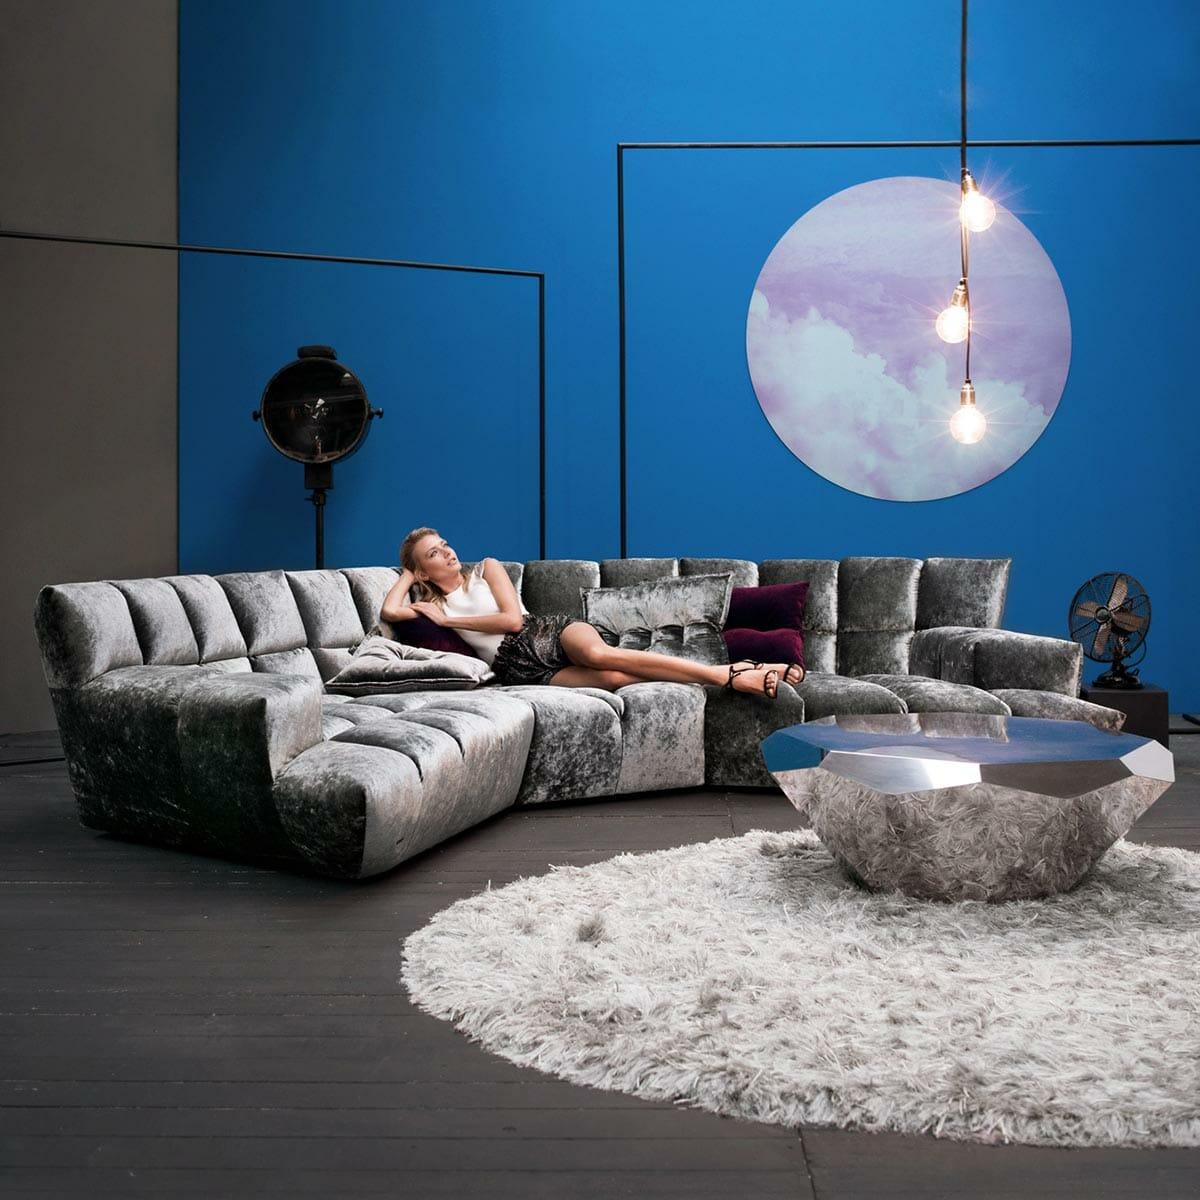 bretz sofa cloud 7 bretz sofa filousof a cloud gaudi q couch gebraucht with bretz sofa cloud 7. Black Bedroom Furniture Sets. Home Design Ideas